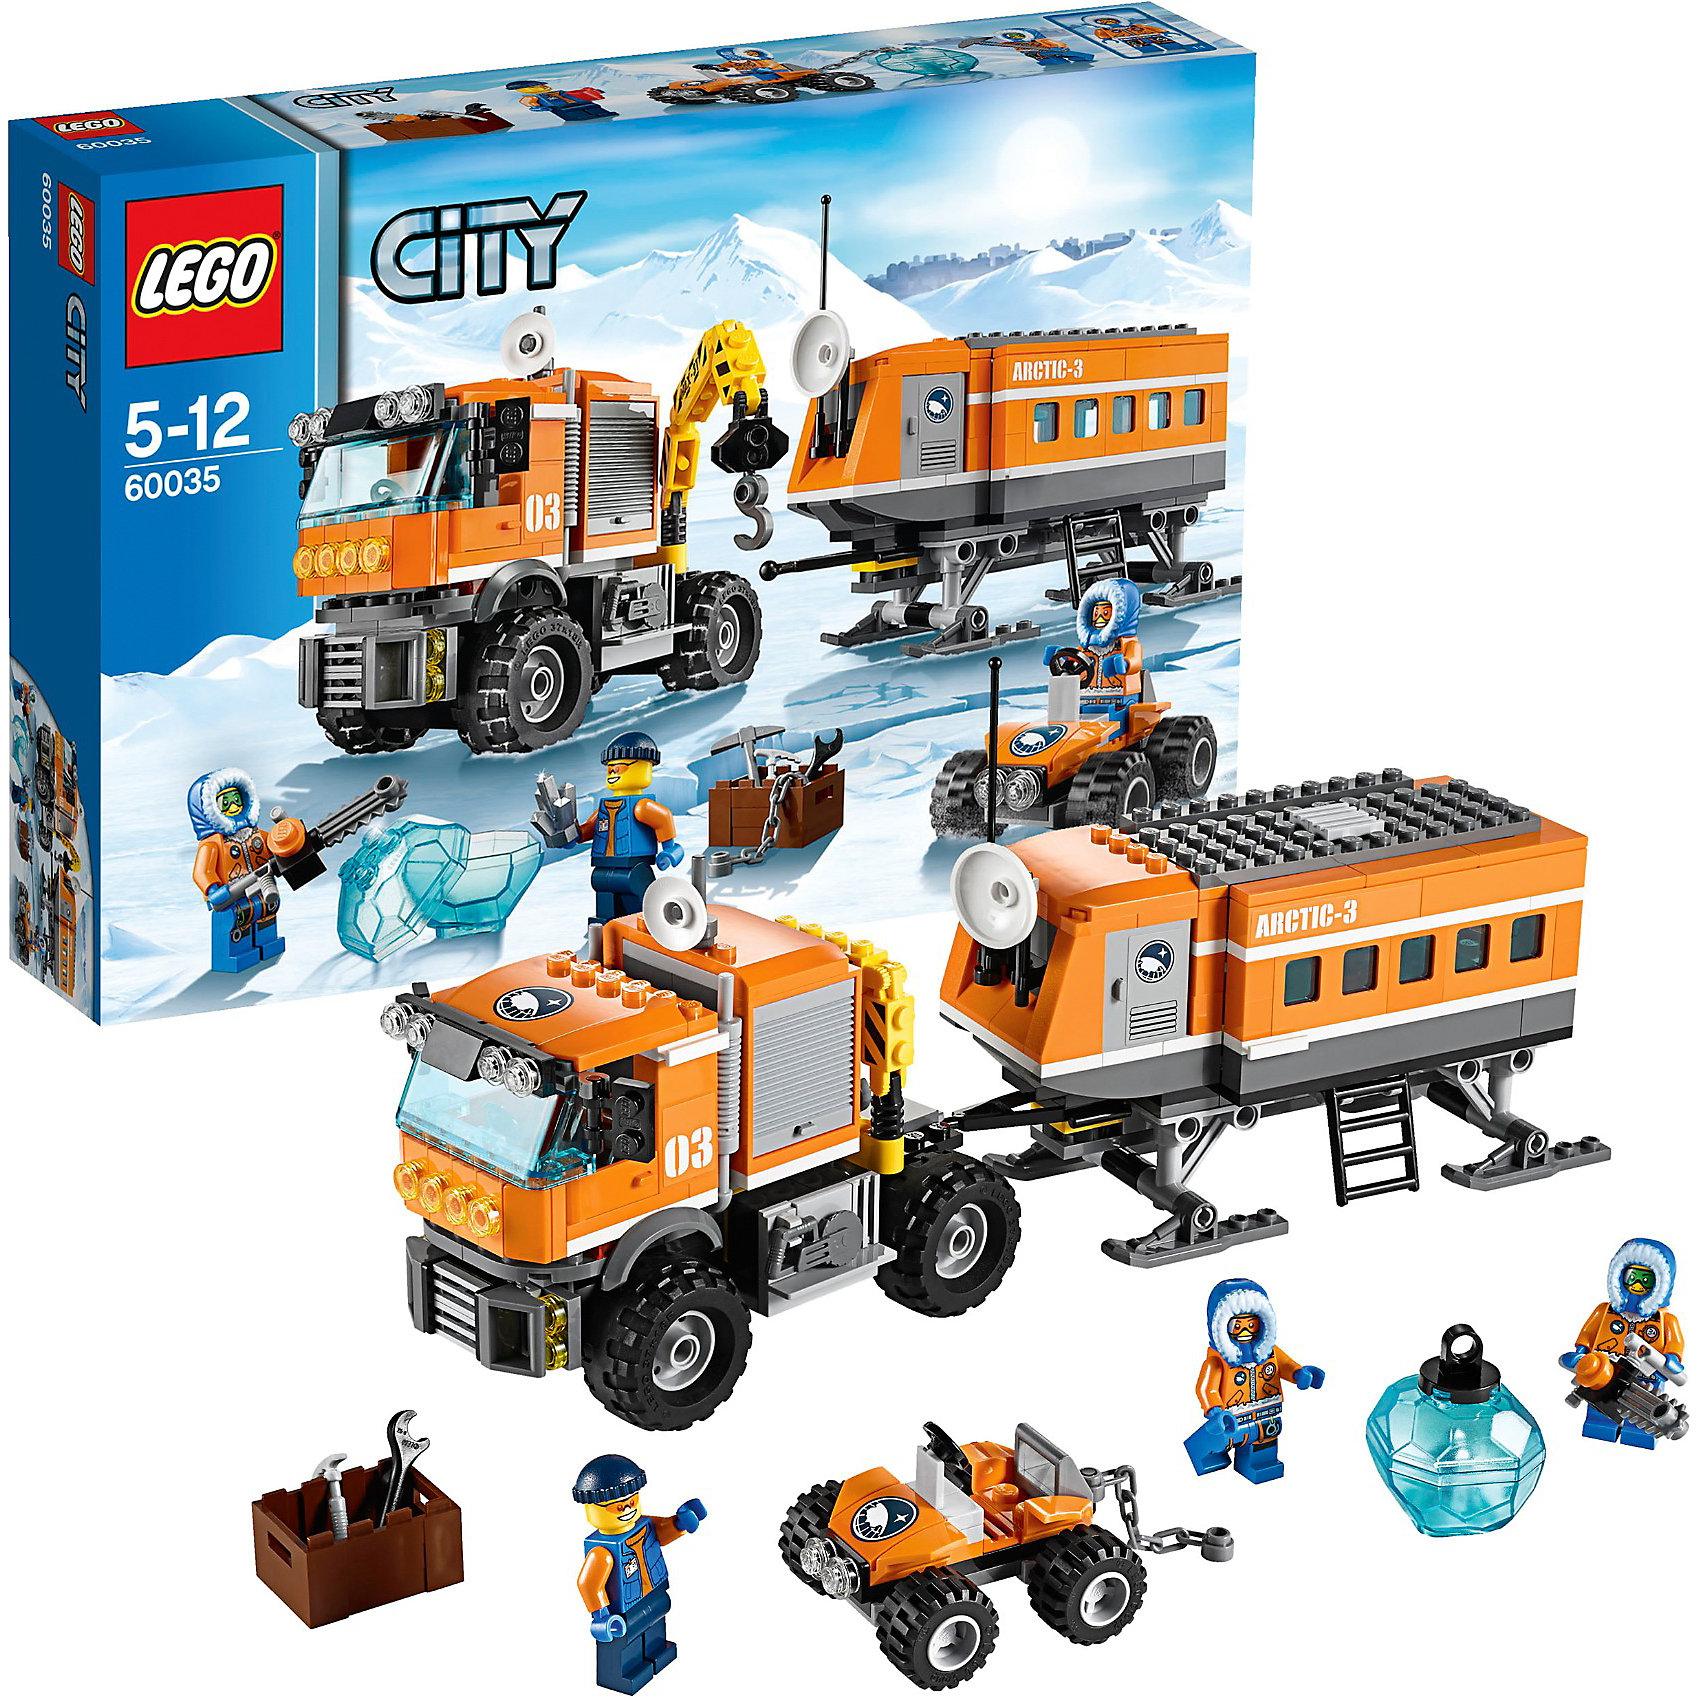 LEGO City 60035: ����������� ����������� ������������������ ����������� ������� �� ������ LEGO City (���� ����) 60035 �������� ��� ����������� ���� �������� �������������� �������. ����� ����������� �������� ������� ����� ������� ����� ����� ������ ��� �������� ���� �� ������� ������. ������ �� ���������� ����, ��������� ��� �������� ���������, ������� � ������� ������ � ������������ ���������, ������� ���������� ������ �� ������� �������. ��������� ����, ��� ������ ������� ���������� �� �� ������, � �� �����, � ����� ����� ���������� � ����� ����� ����������� �������. � ��������� ������� ������� ��������, ��������� ������ �������� �������� ������������ � ������. �� ����� ����� ����������� �������, ��������������� ��� ����� � ������� ��������. �� ������� �������� ���������� �������� �������� ���� � �������� ����� � ������������� �������. � �� ����� ������� ���������� ���� � ������������� ��������� ��� ������� ���������.<br><br>� ��������� ������ LEGO City ���������� �������� ����� � ������� �����������, � ���������������� ������� �������, �  ���������� ���������� ������ ������, � ����� ������������ �������� � �������� ������ � ���������. ��������� ������ �� ����� LEGO City (���� ����) ����� ������� ����������� ����� ����� ��������� ����� ����������.<br><br>�������������� ����������:<br><br>- ������������ LEGO City (���� ����) ��������� ���������� �������� � �������� ������� ��������� �������� ����;<br>- ���������� �������: 374 ��;<br>- � ����� ������ ��������, ����������� �������, 3 ����������� � �������������� ������������: ����������, ���� � �������������, ��������;<br>- �����: ���� ����;<br>- ��������: �������;<br>- ������ ��������: 26,2 � 38,2 � 71 ��;<br>- ���: 822 �<br><br>����������� LEGO City (���� ����) 60035: ����������� ����������� ������� ����� ������ � ����� ��������-��������.<br><br>������ ��: 387<br>������� ��: 258<br>������ ��: 79<br>��� �: 735<br>������� �� �������: 60<br>������� �� �������: 144<br>���: �������<br>�������: �������<br>SKU: 3623199